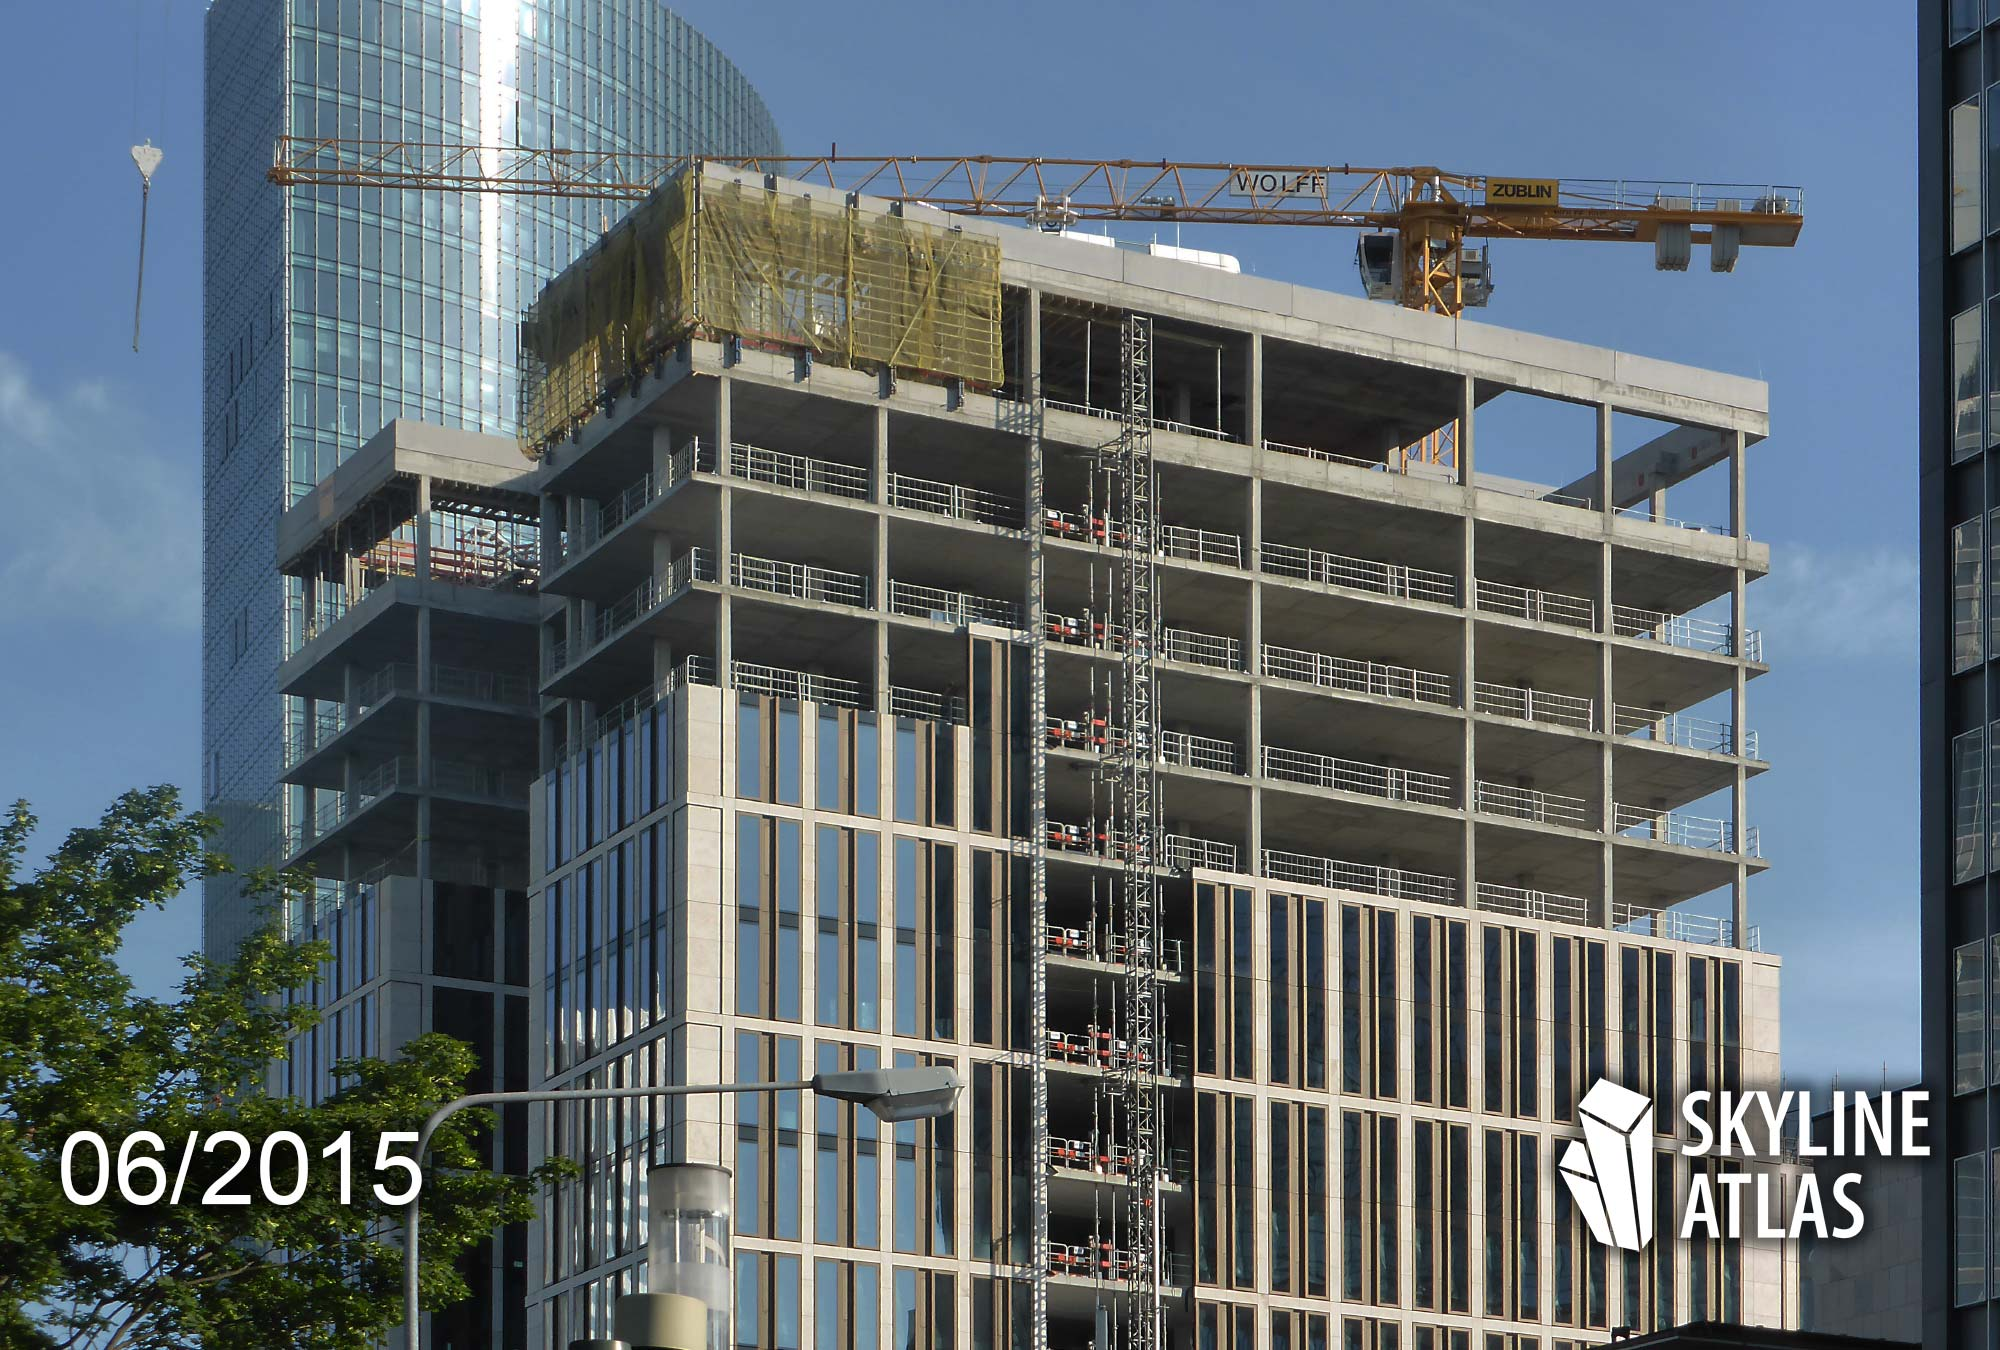 Taunusanlage 8 in Frankfurt am Main - T8 - Baustelle Juni 2015 - Credit Suisse Frankfurt Hochhaus